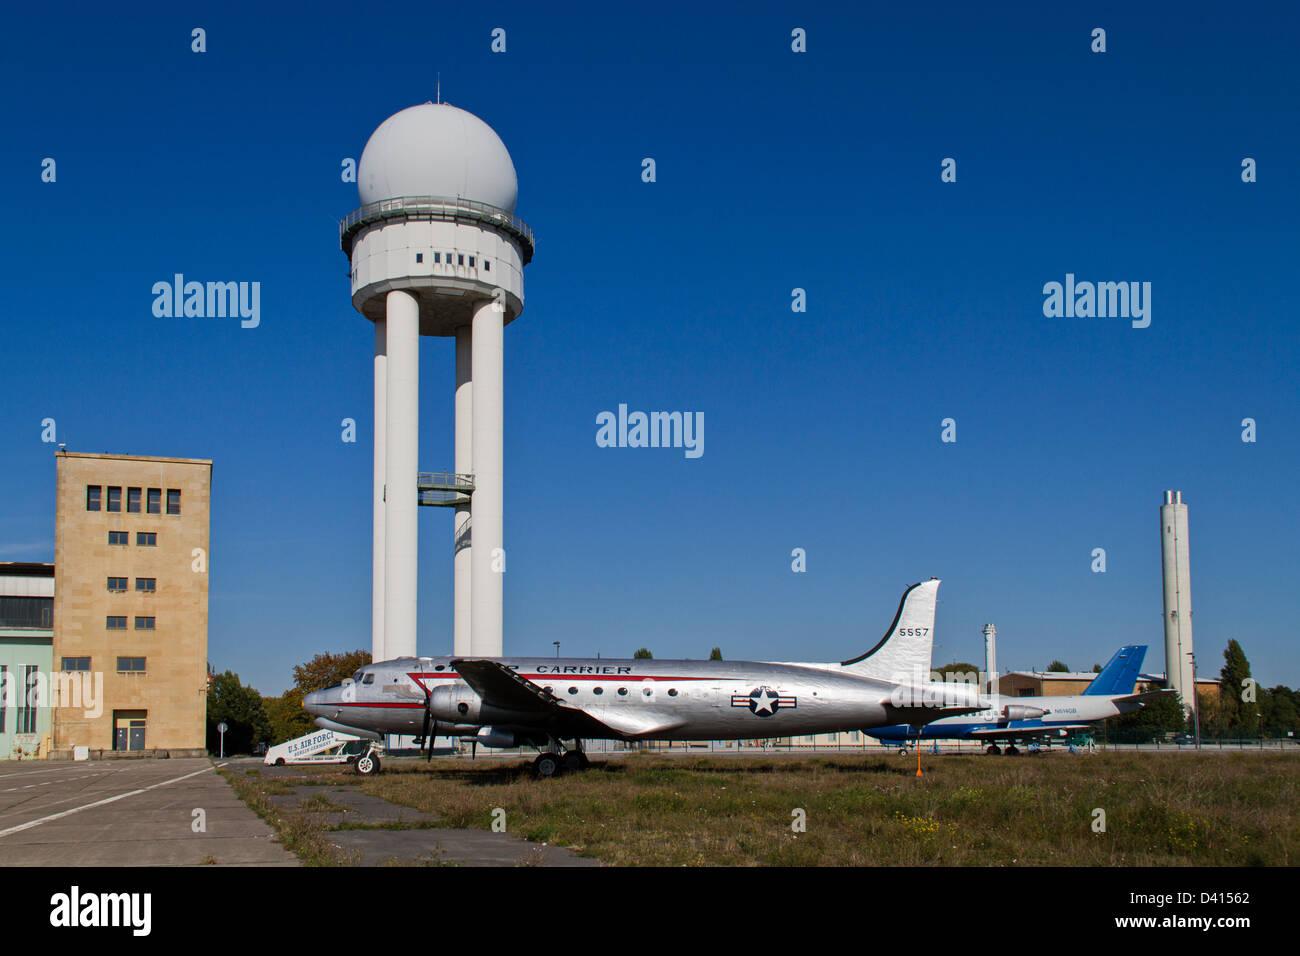 Tempelhof, DC3, Raisin Bomber, Rosinenbomber, Berlin, Germany - Stock Image